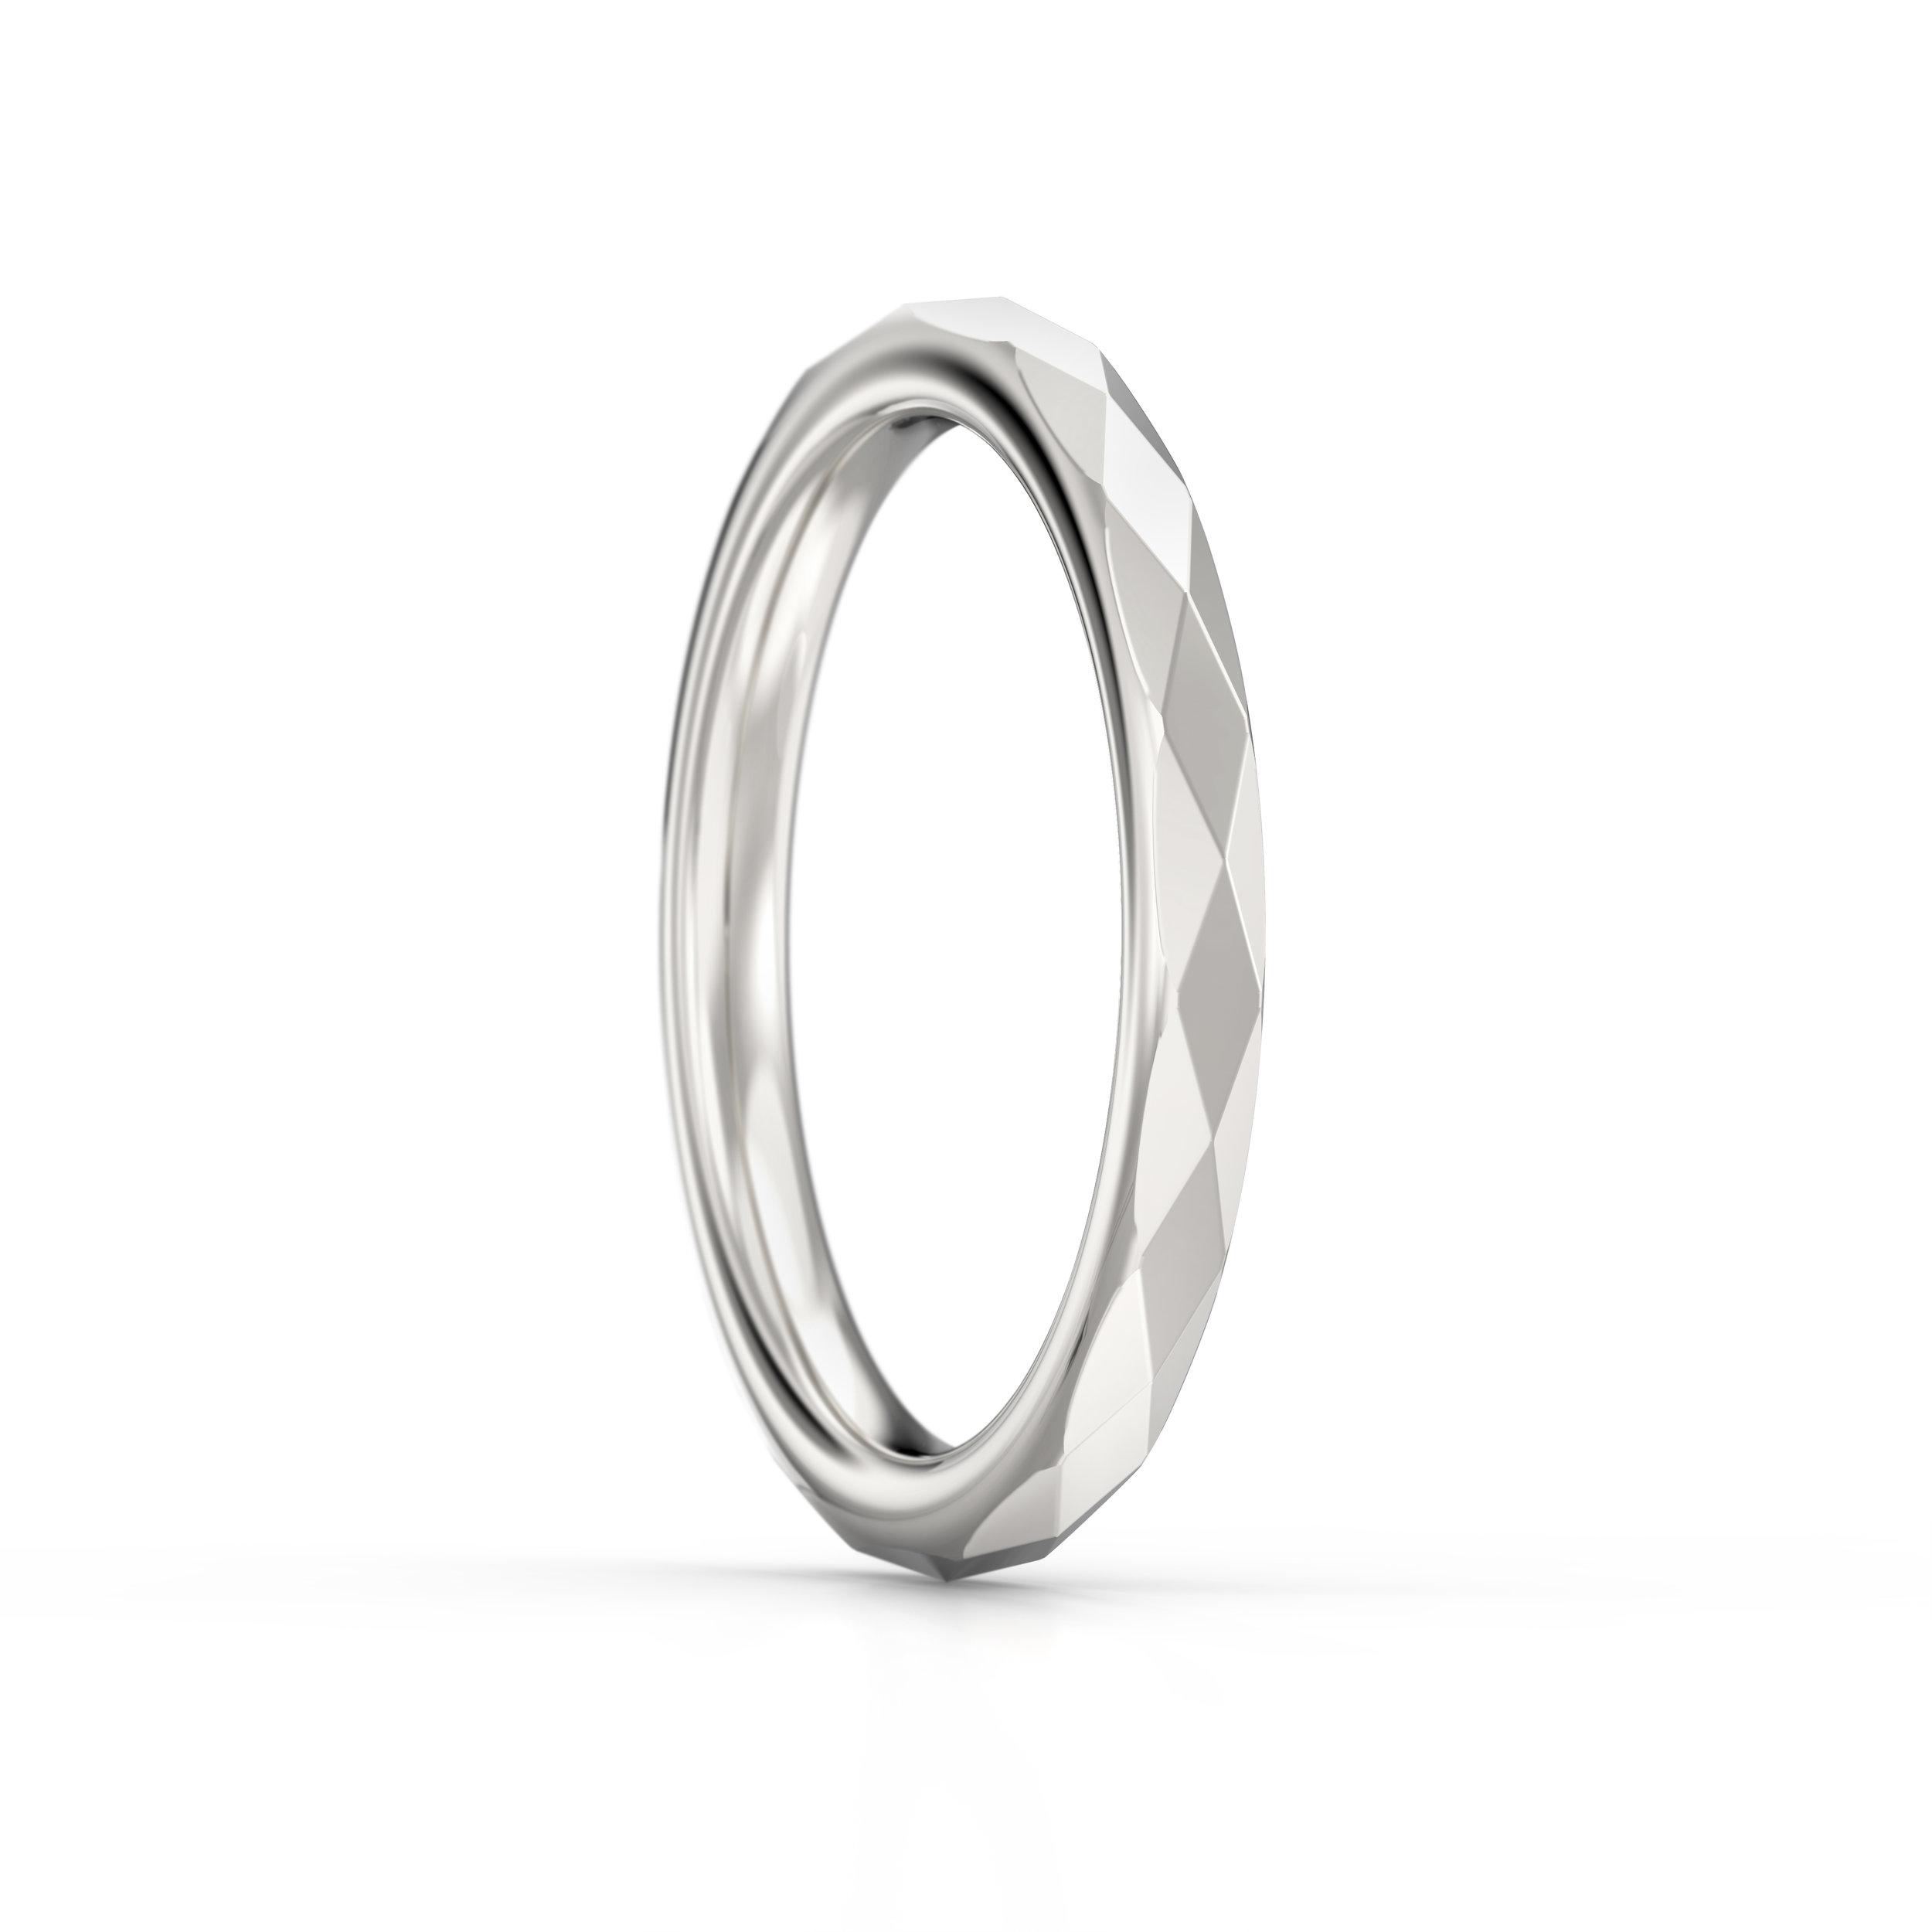 Ring_051_2.jpg